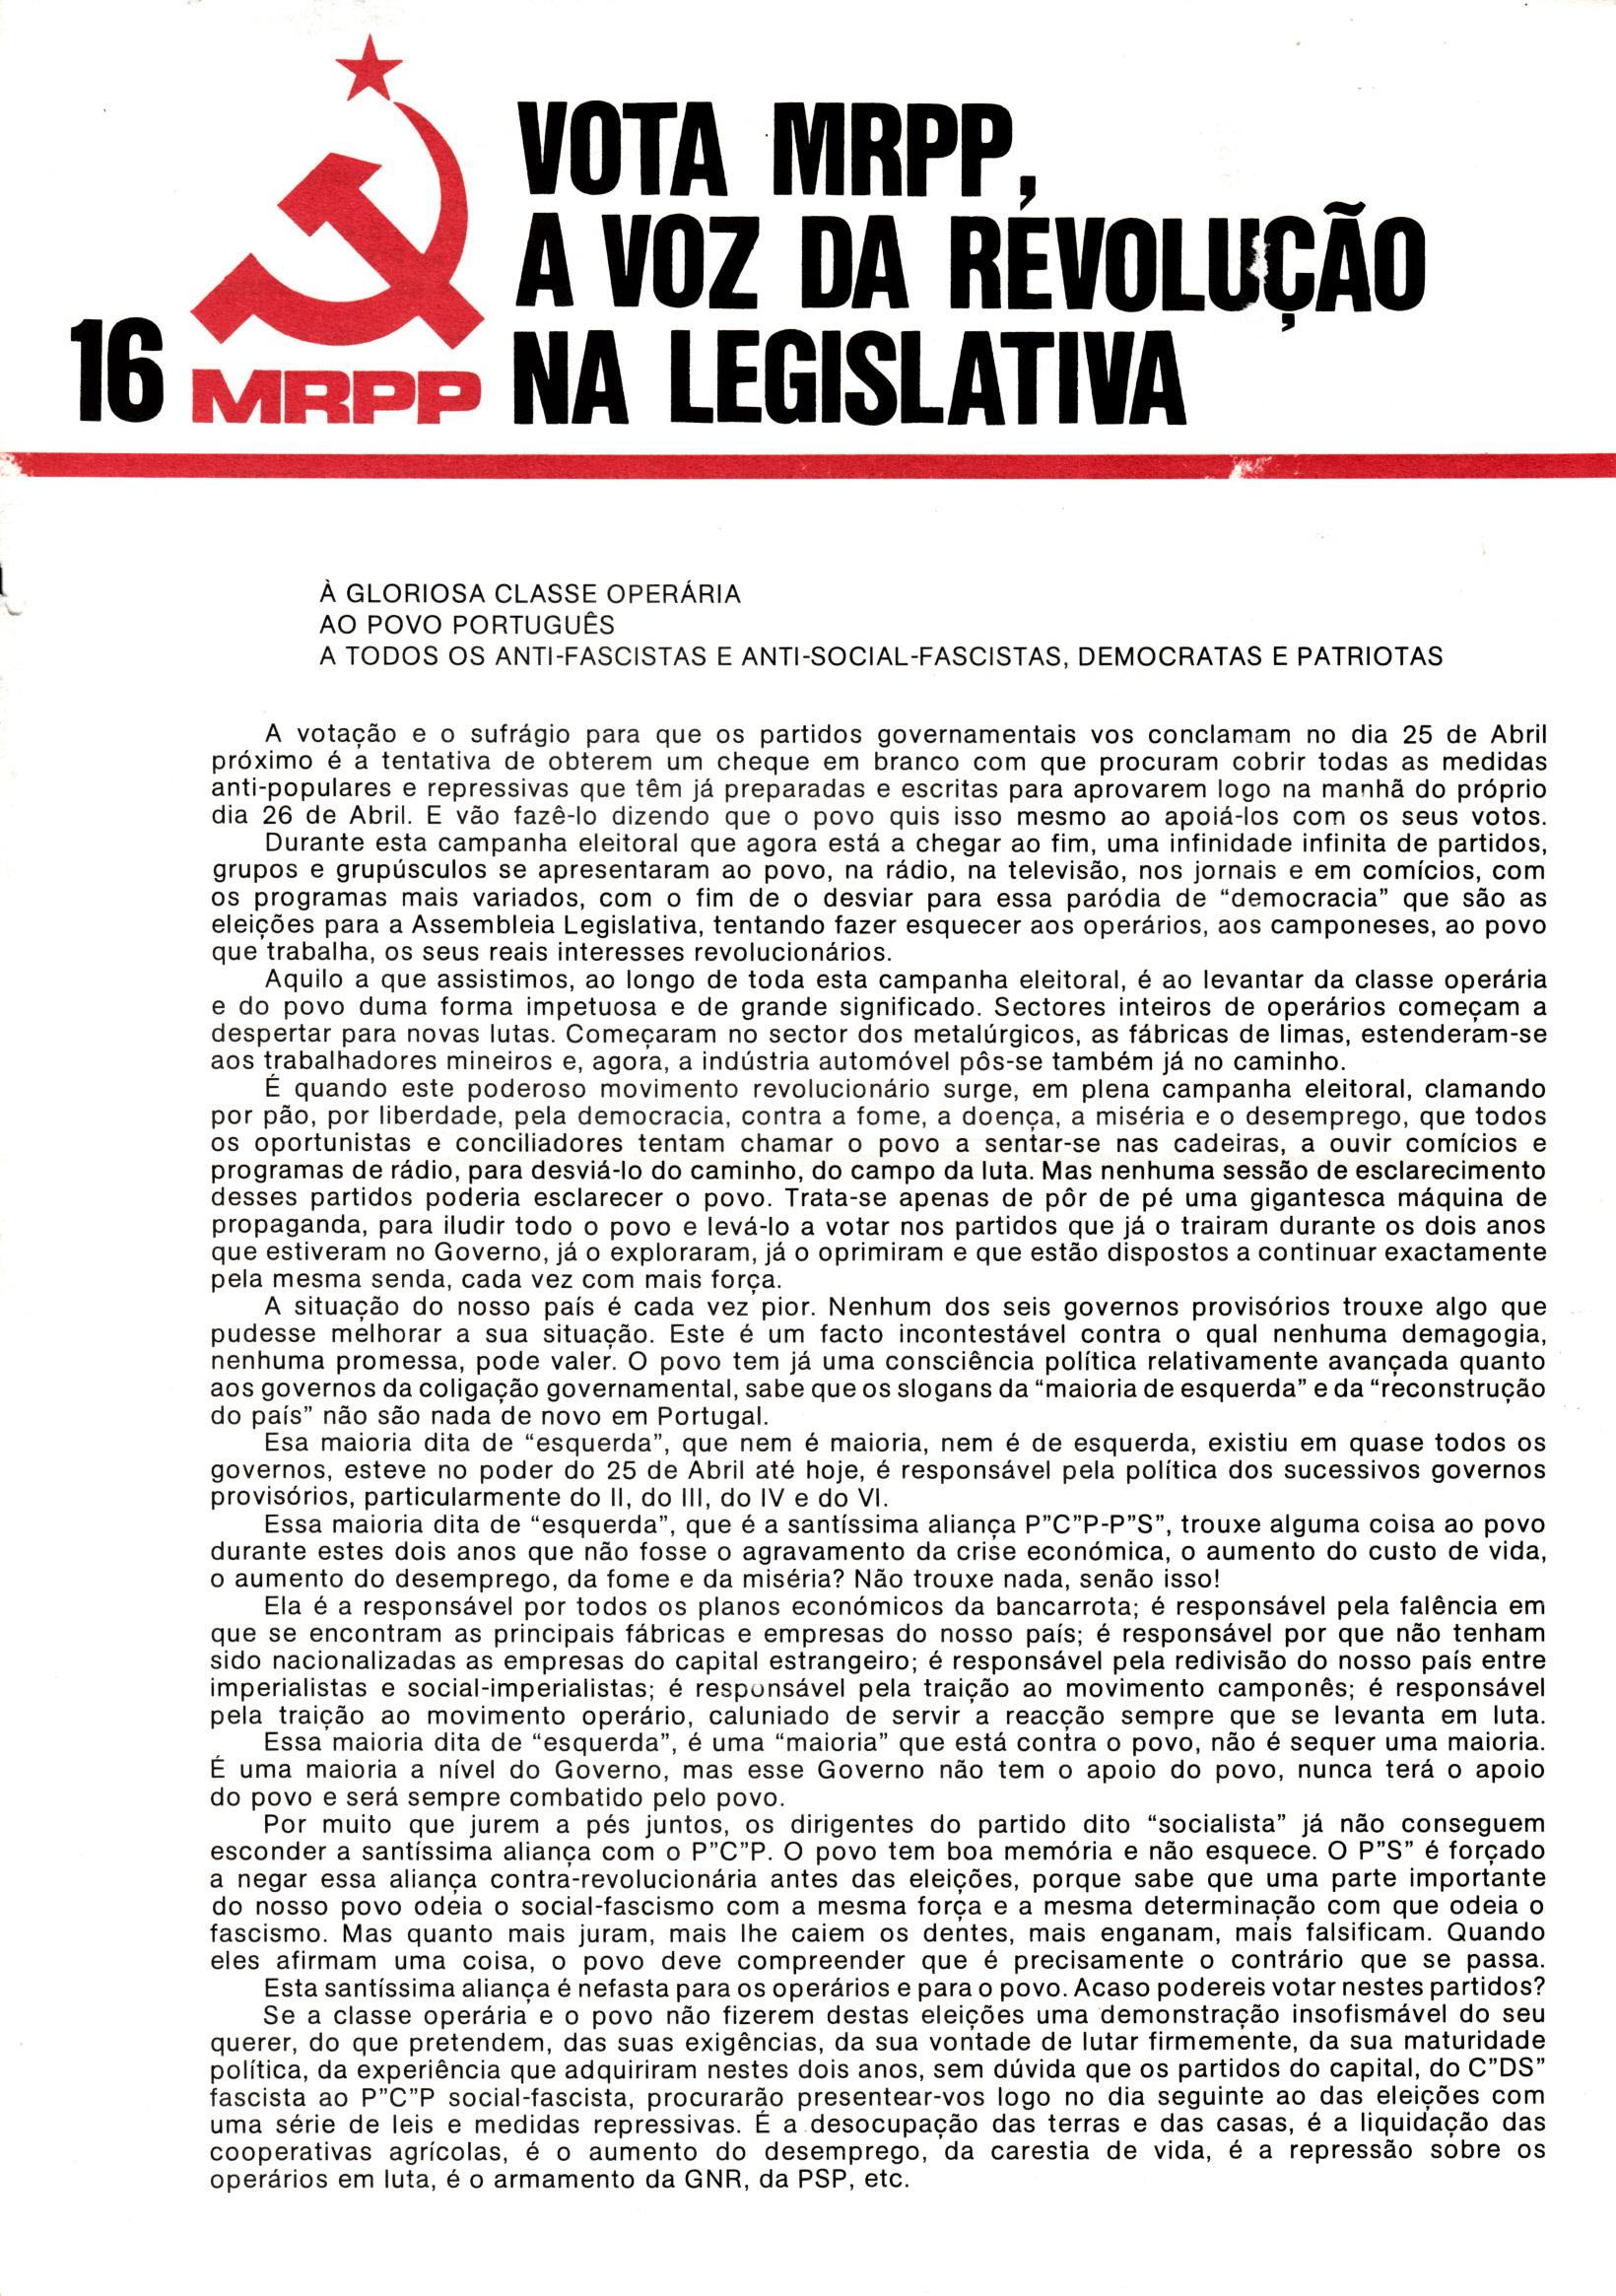 mrpp_1976_eleicao_programa_0031